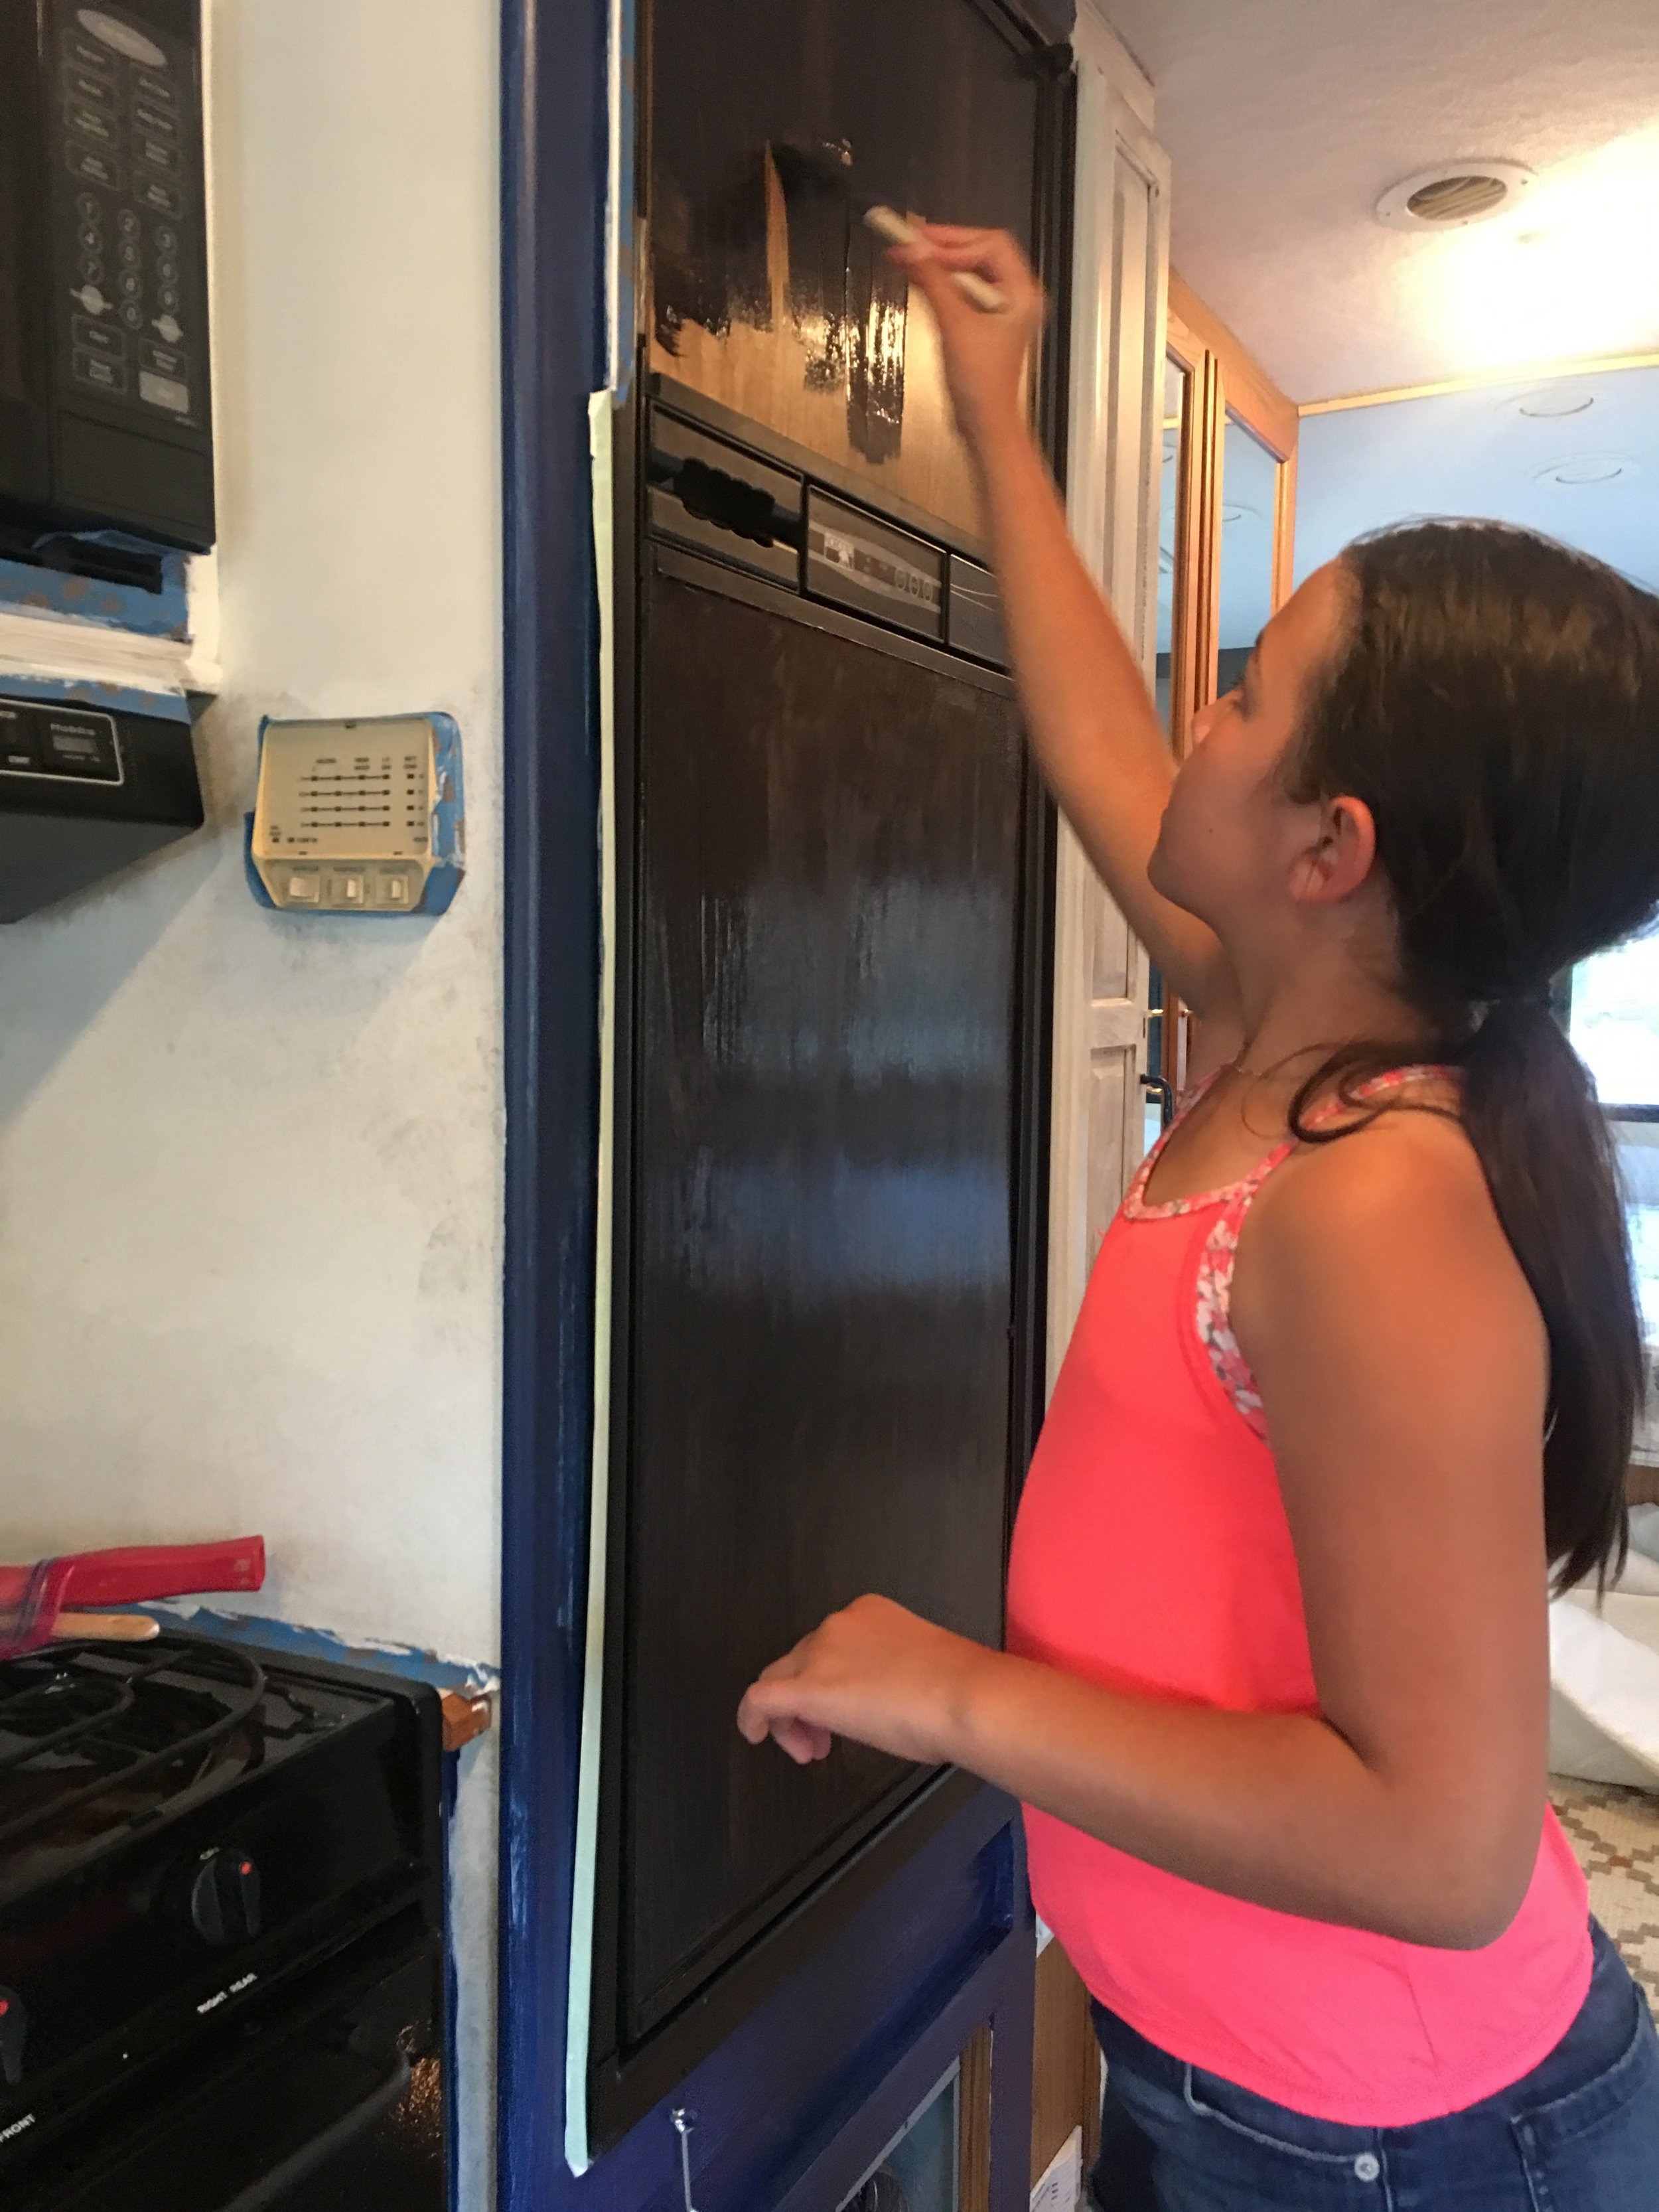 Gotta have a chalkboard fridge!